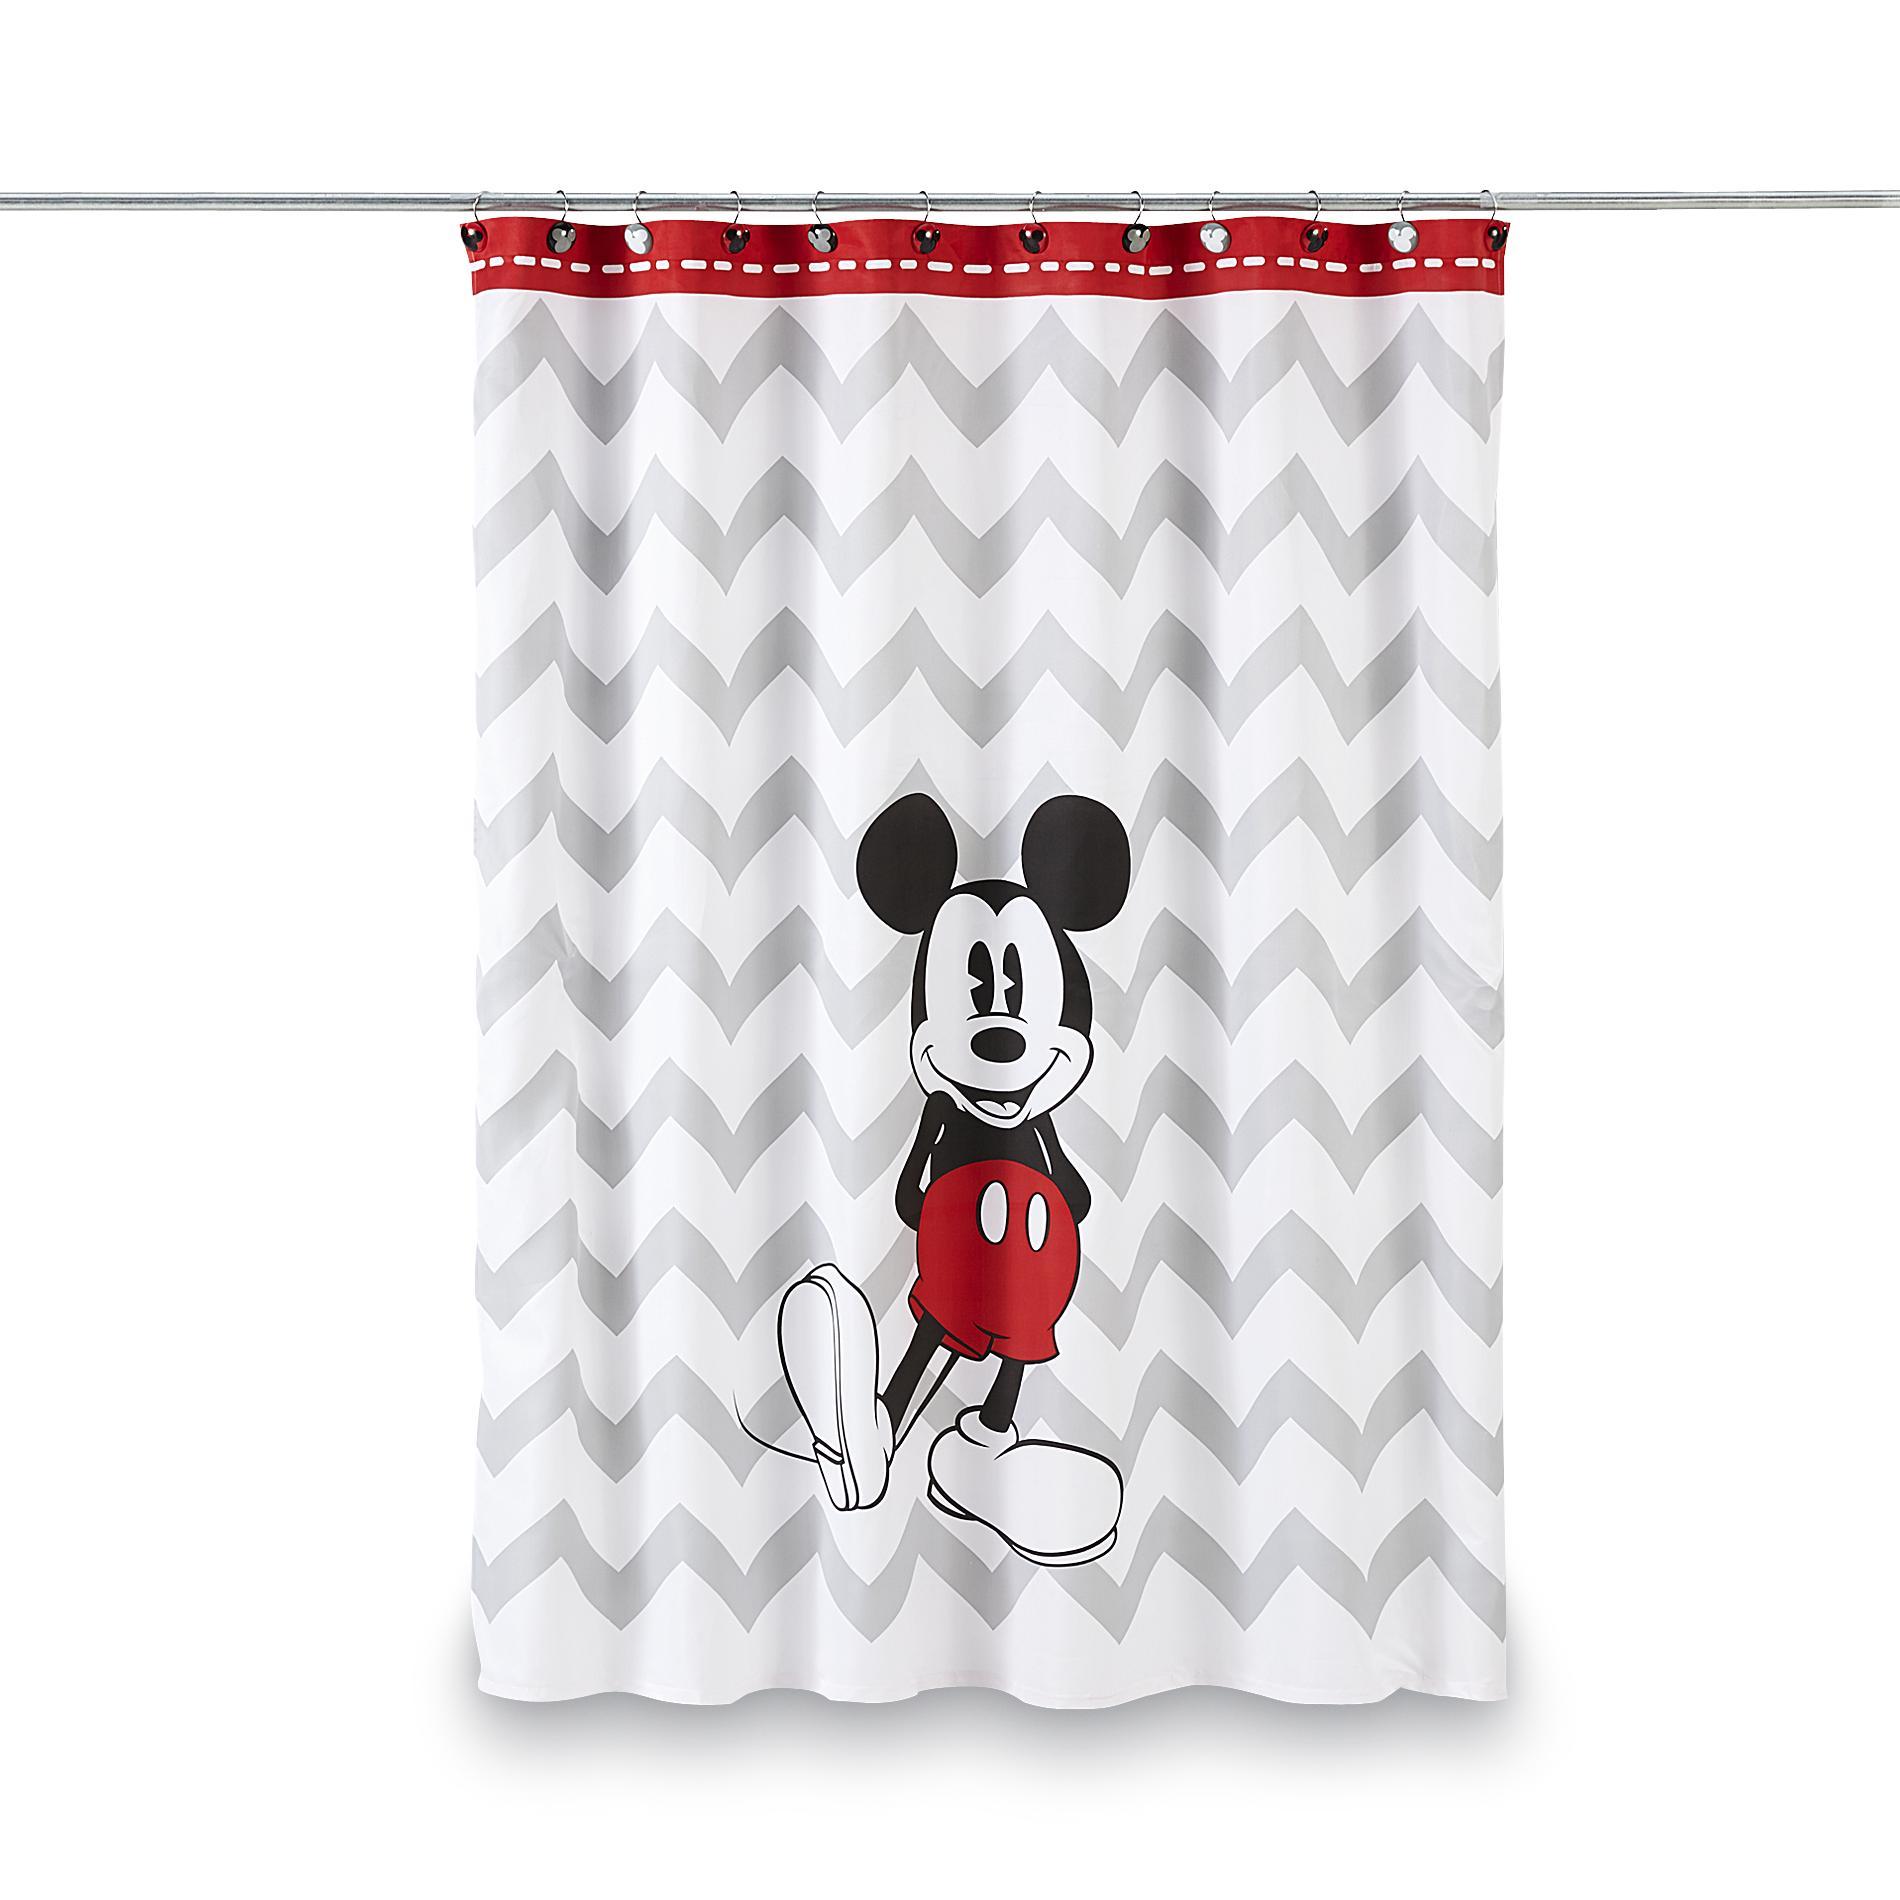 Disney Mickey Mouse Shower Curtain Chevron